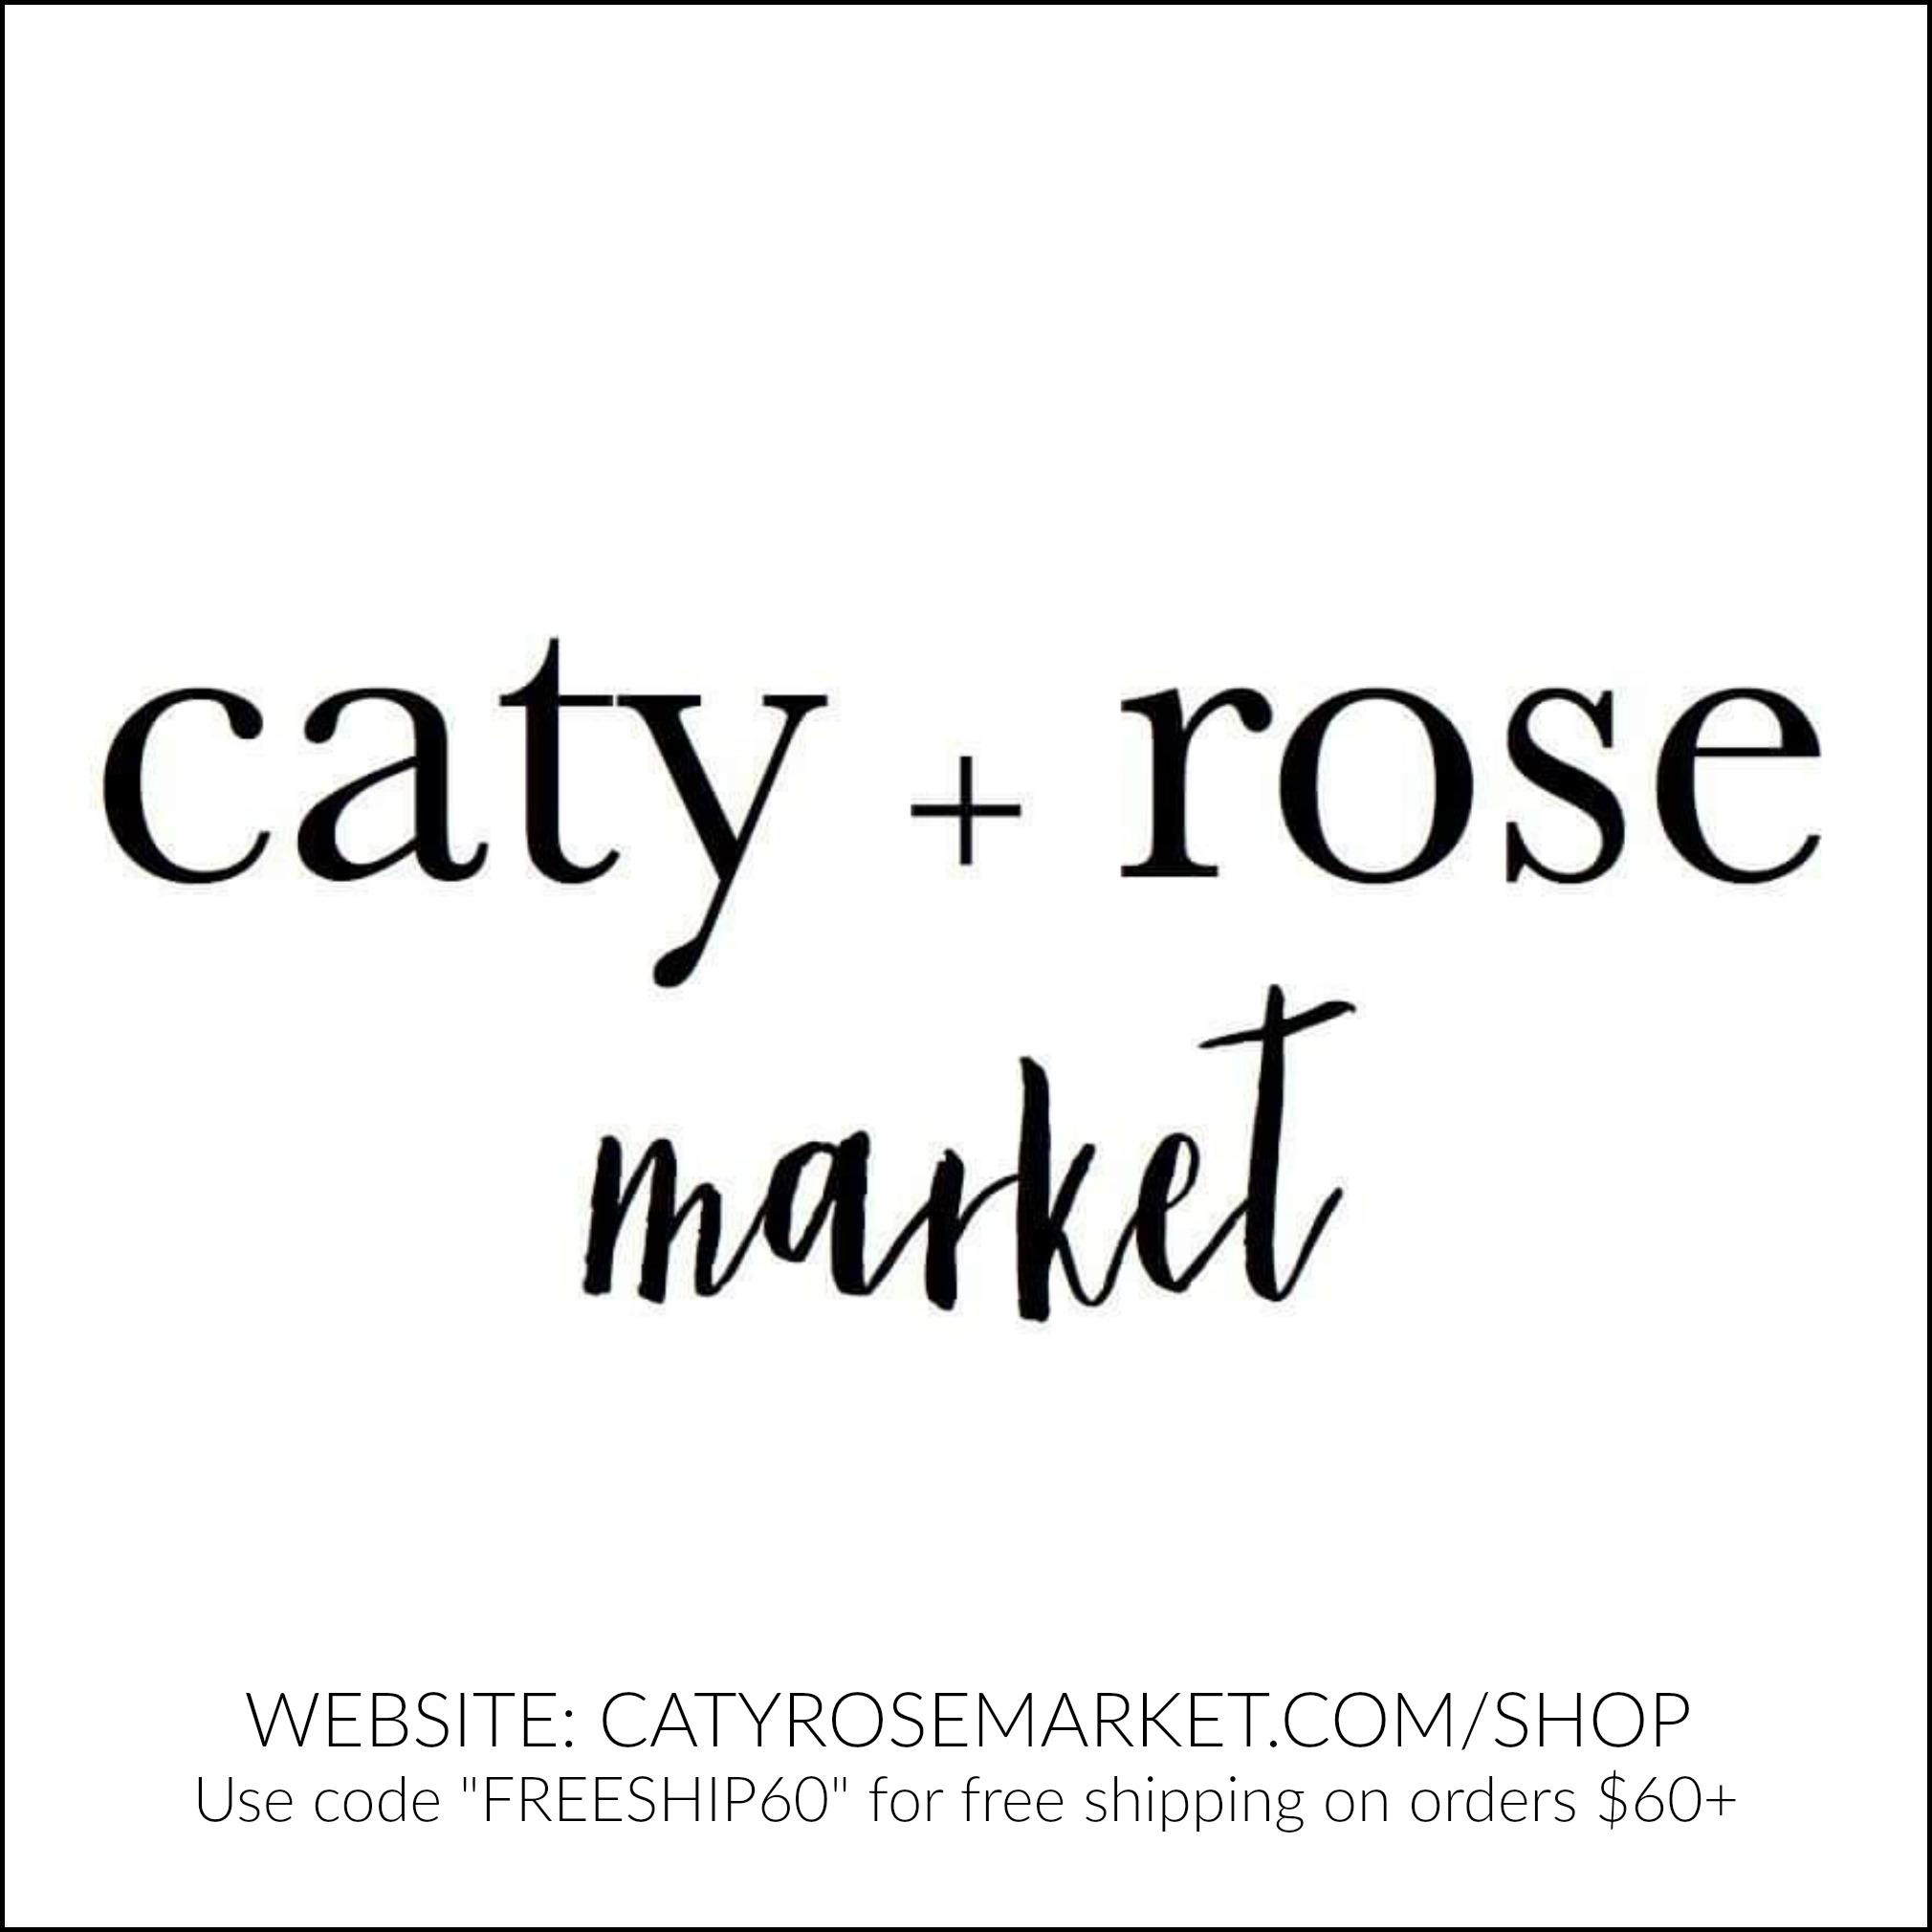 Caty + Rose Market | Catyrosemarket.com/shop